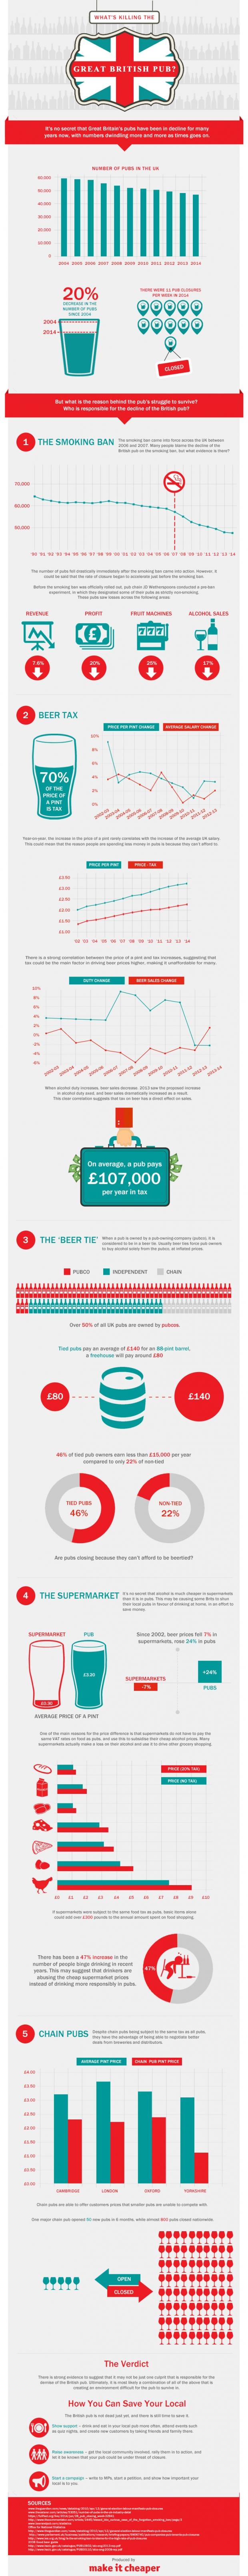 Pub-Infographic-MIC